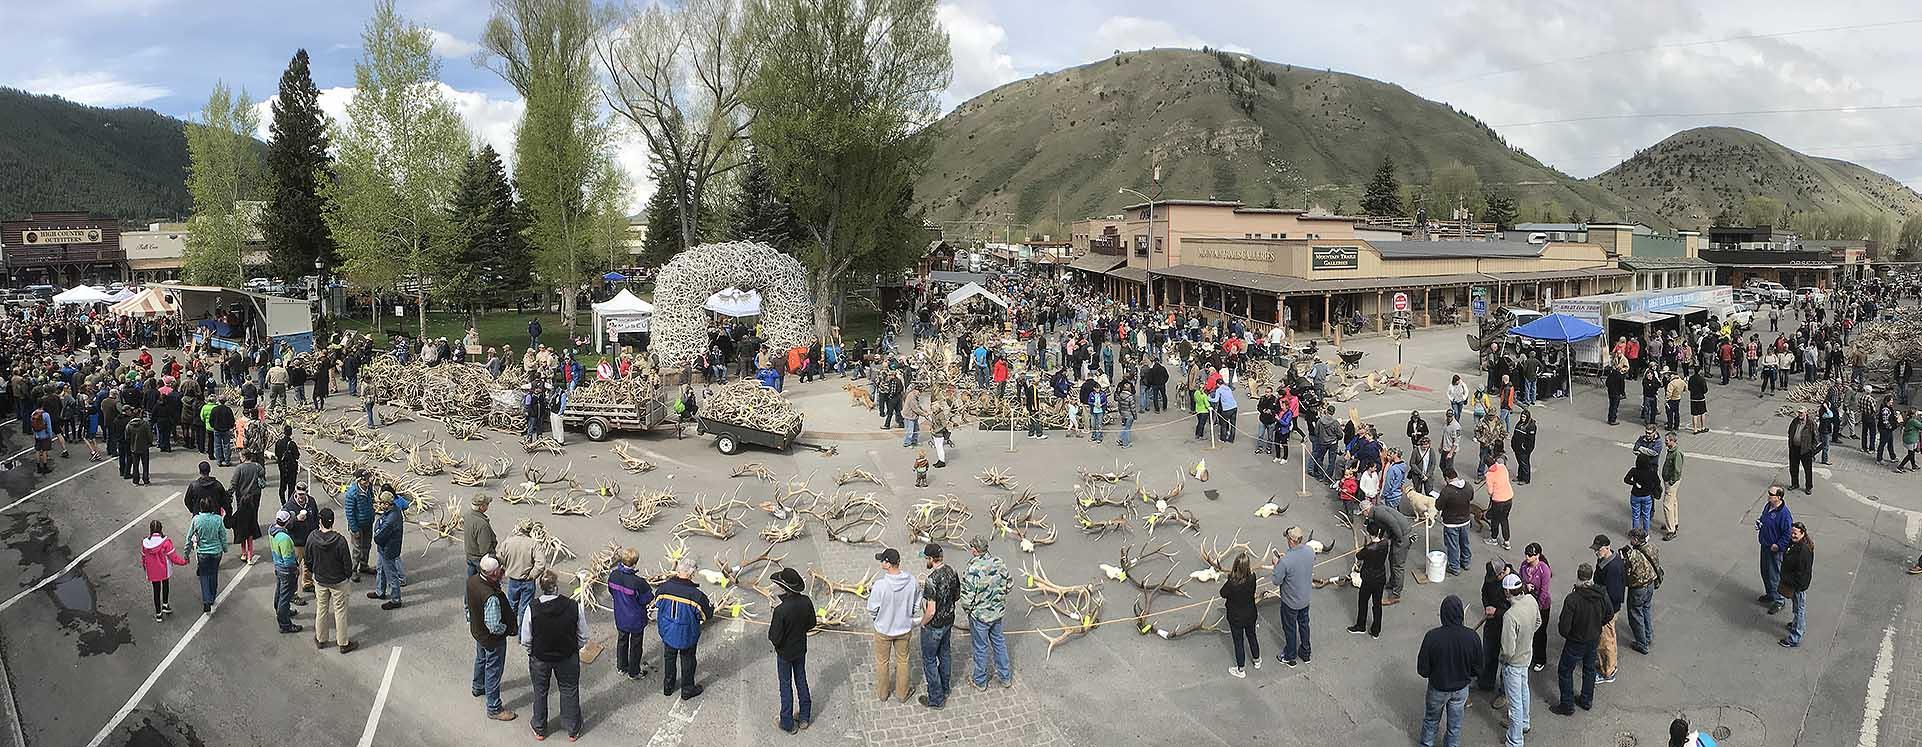 Elkfest in Jackson Hole